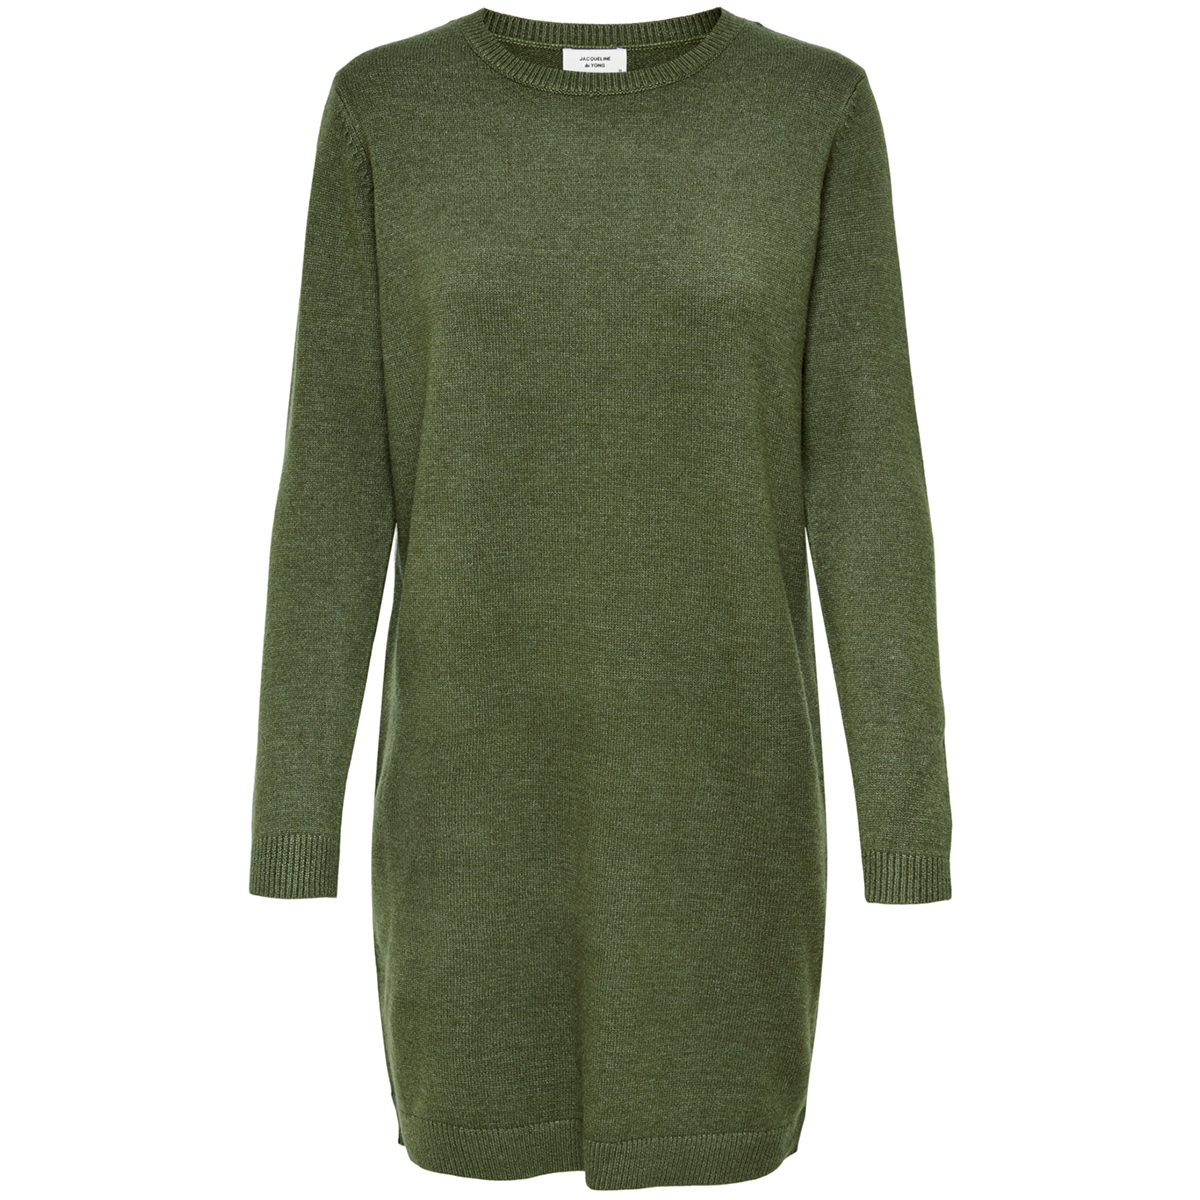 jdymarco l/s dress knt noos 15184977 jacqueline de yong jurk forest night/melange